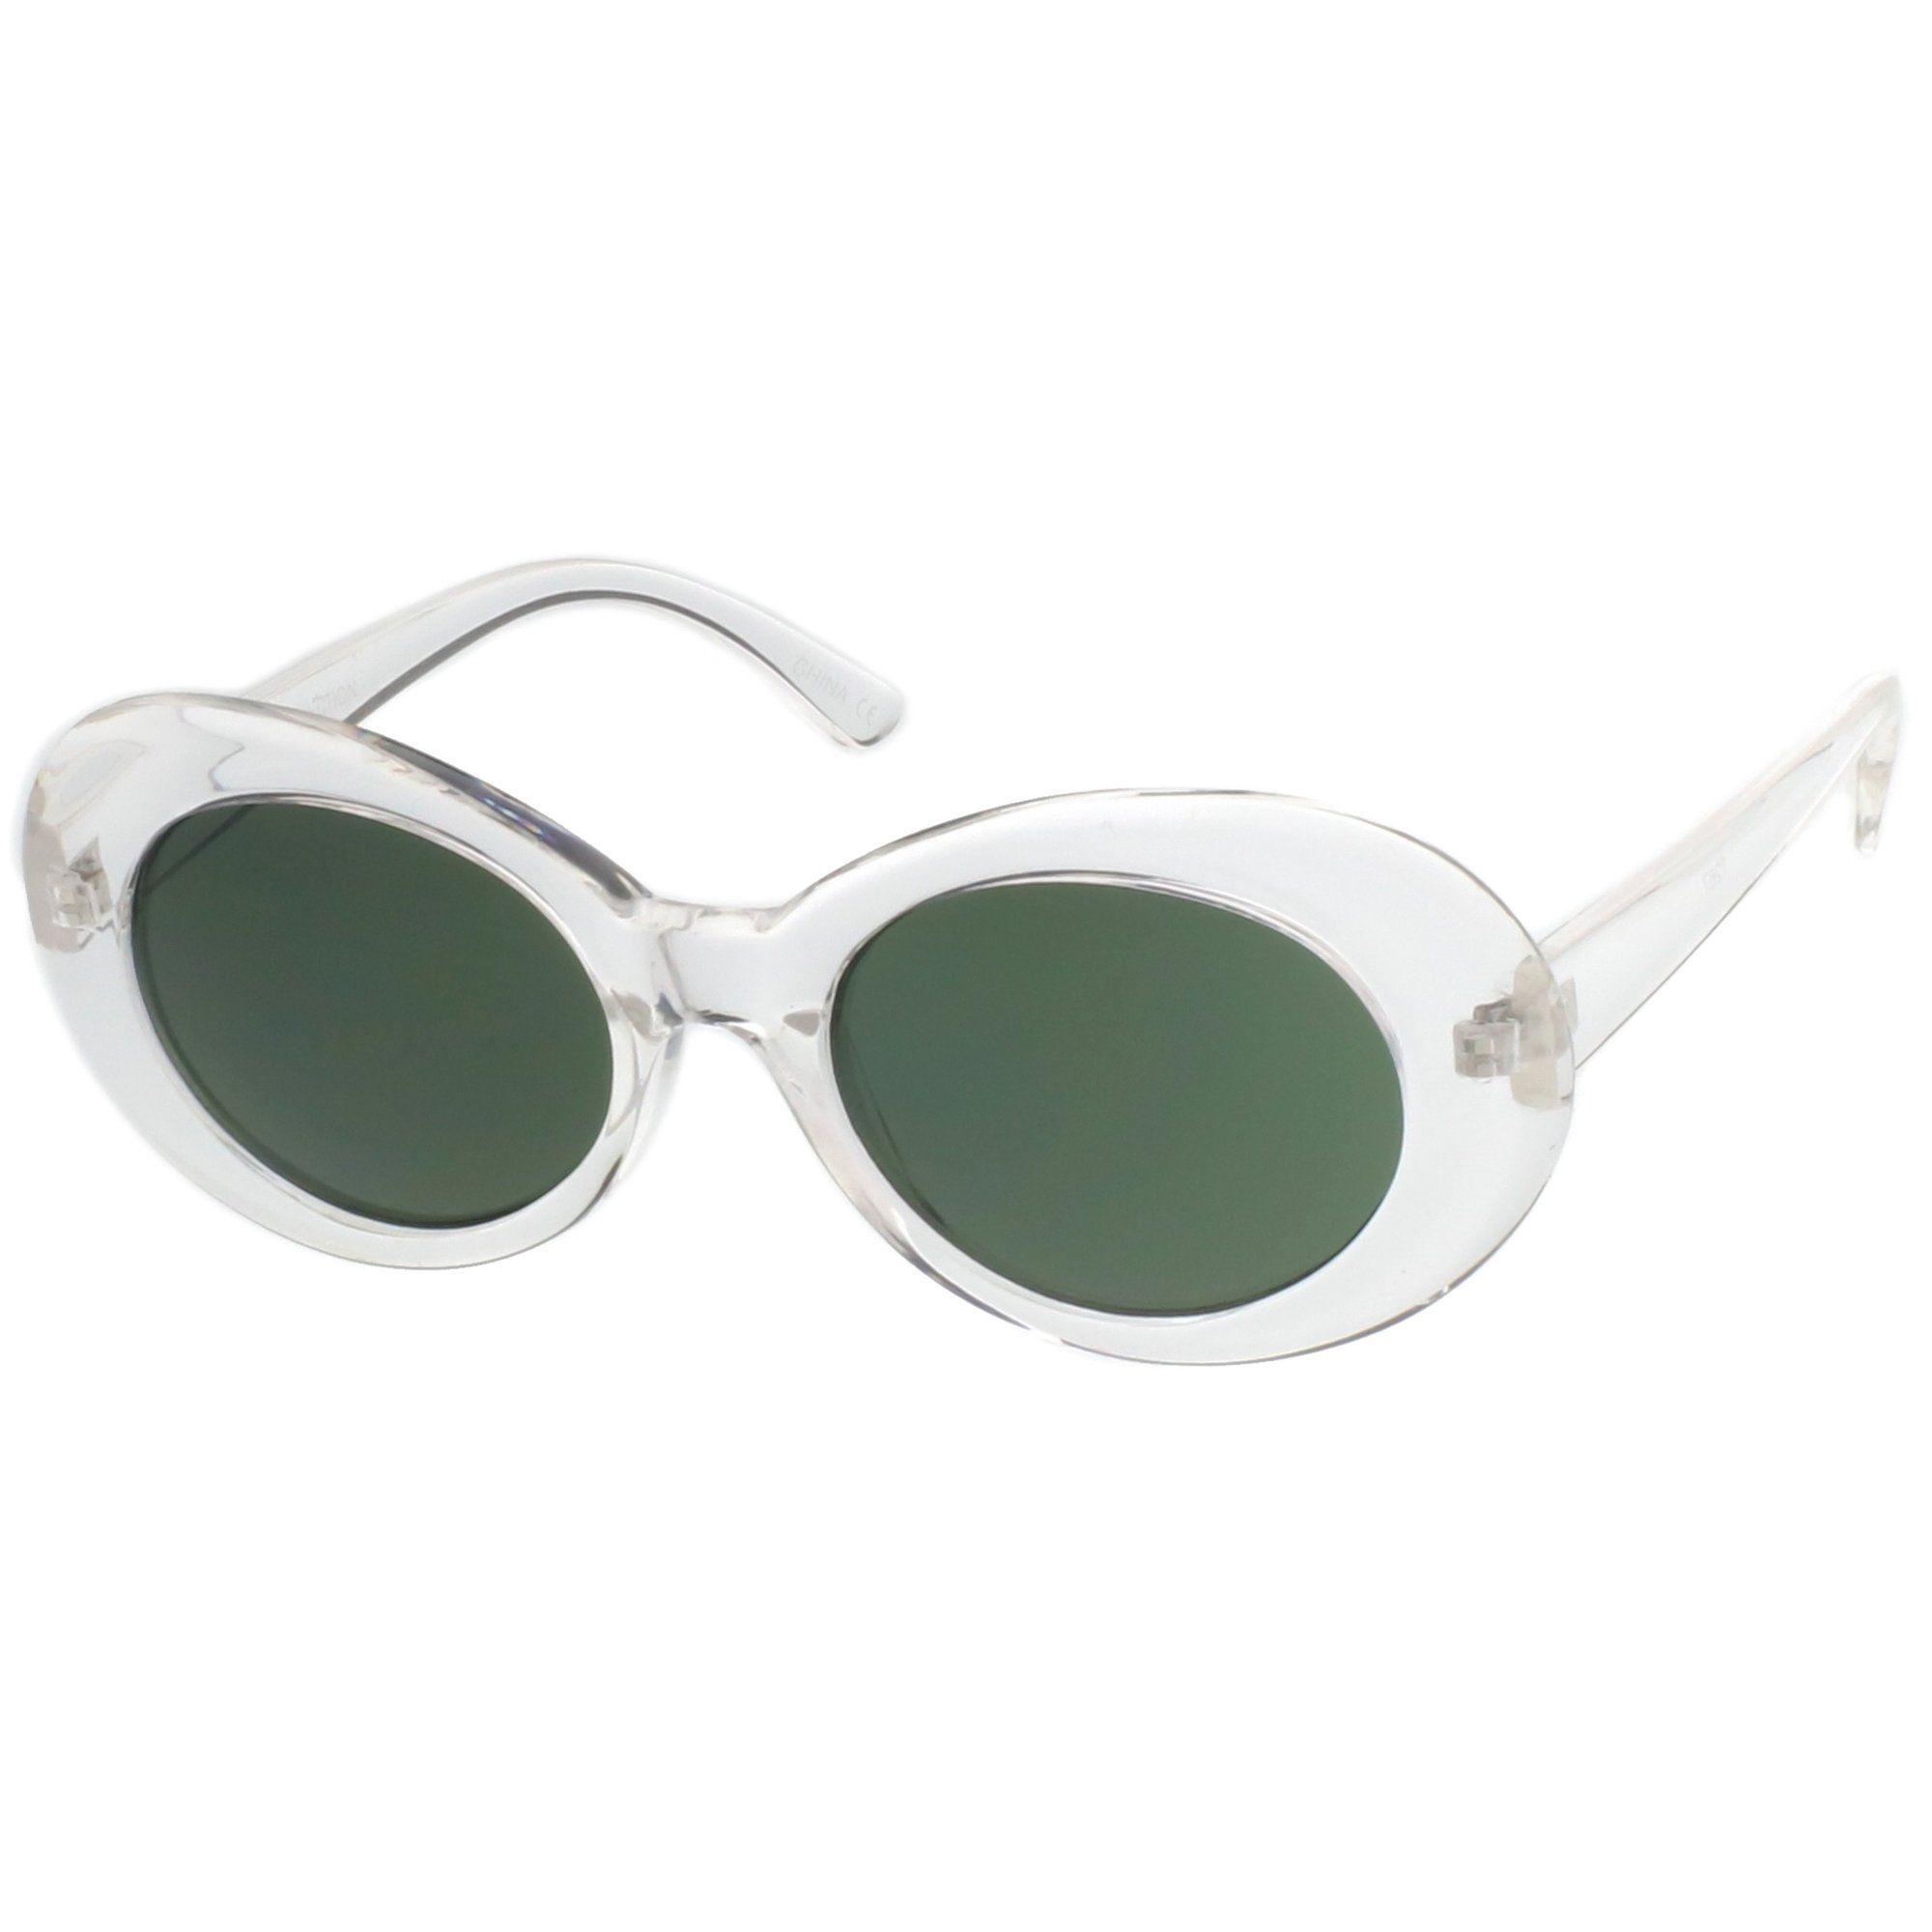 Retro 1990 S Fashion Oval Clout Goggle Sunglasses 51mm C381 In 2020 Sunglasses Glasses Fashion Oval Sunglasses